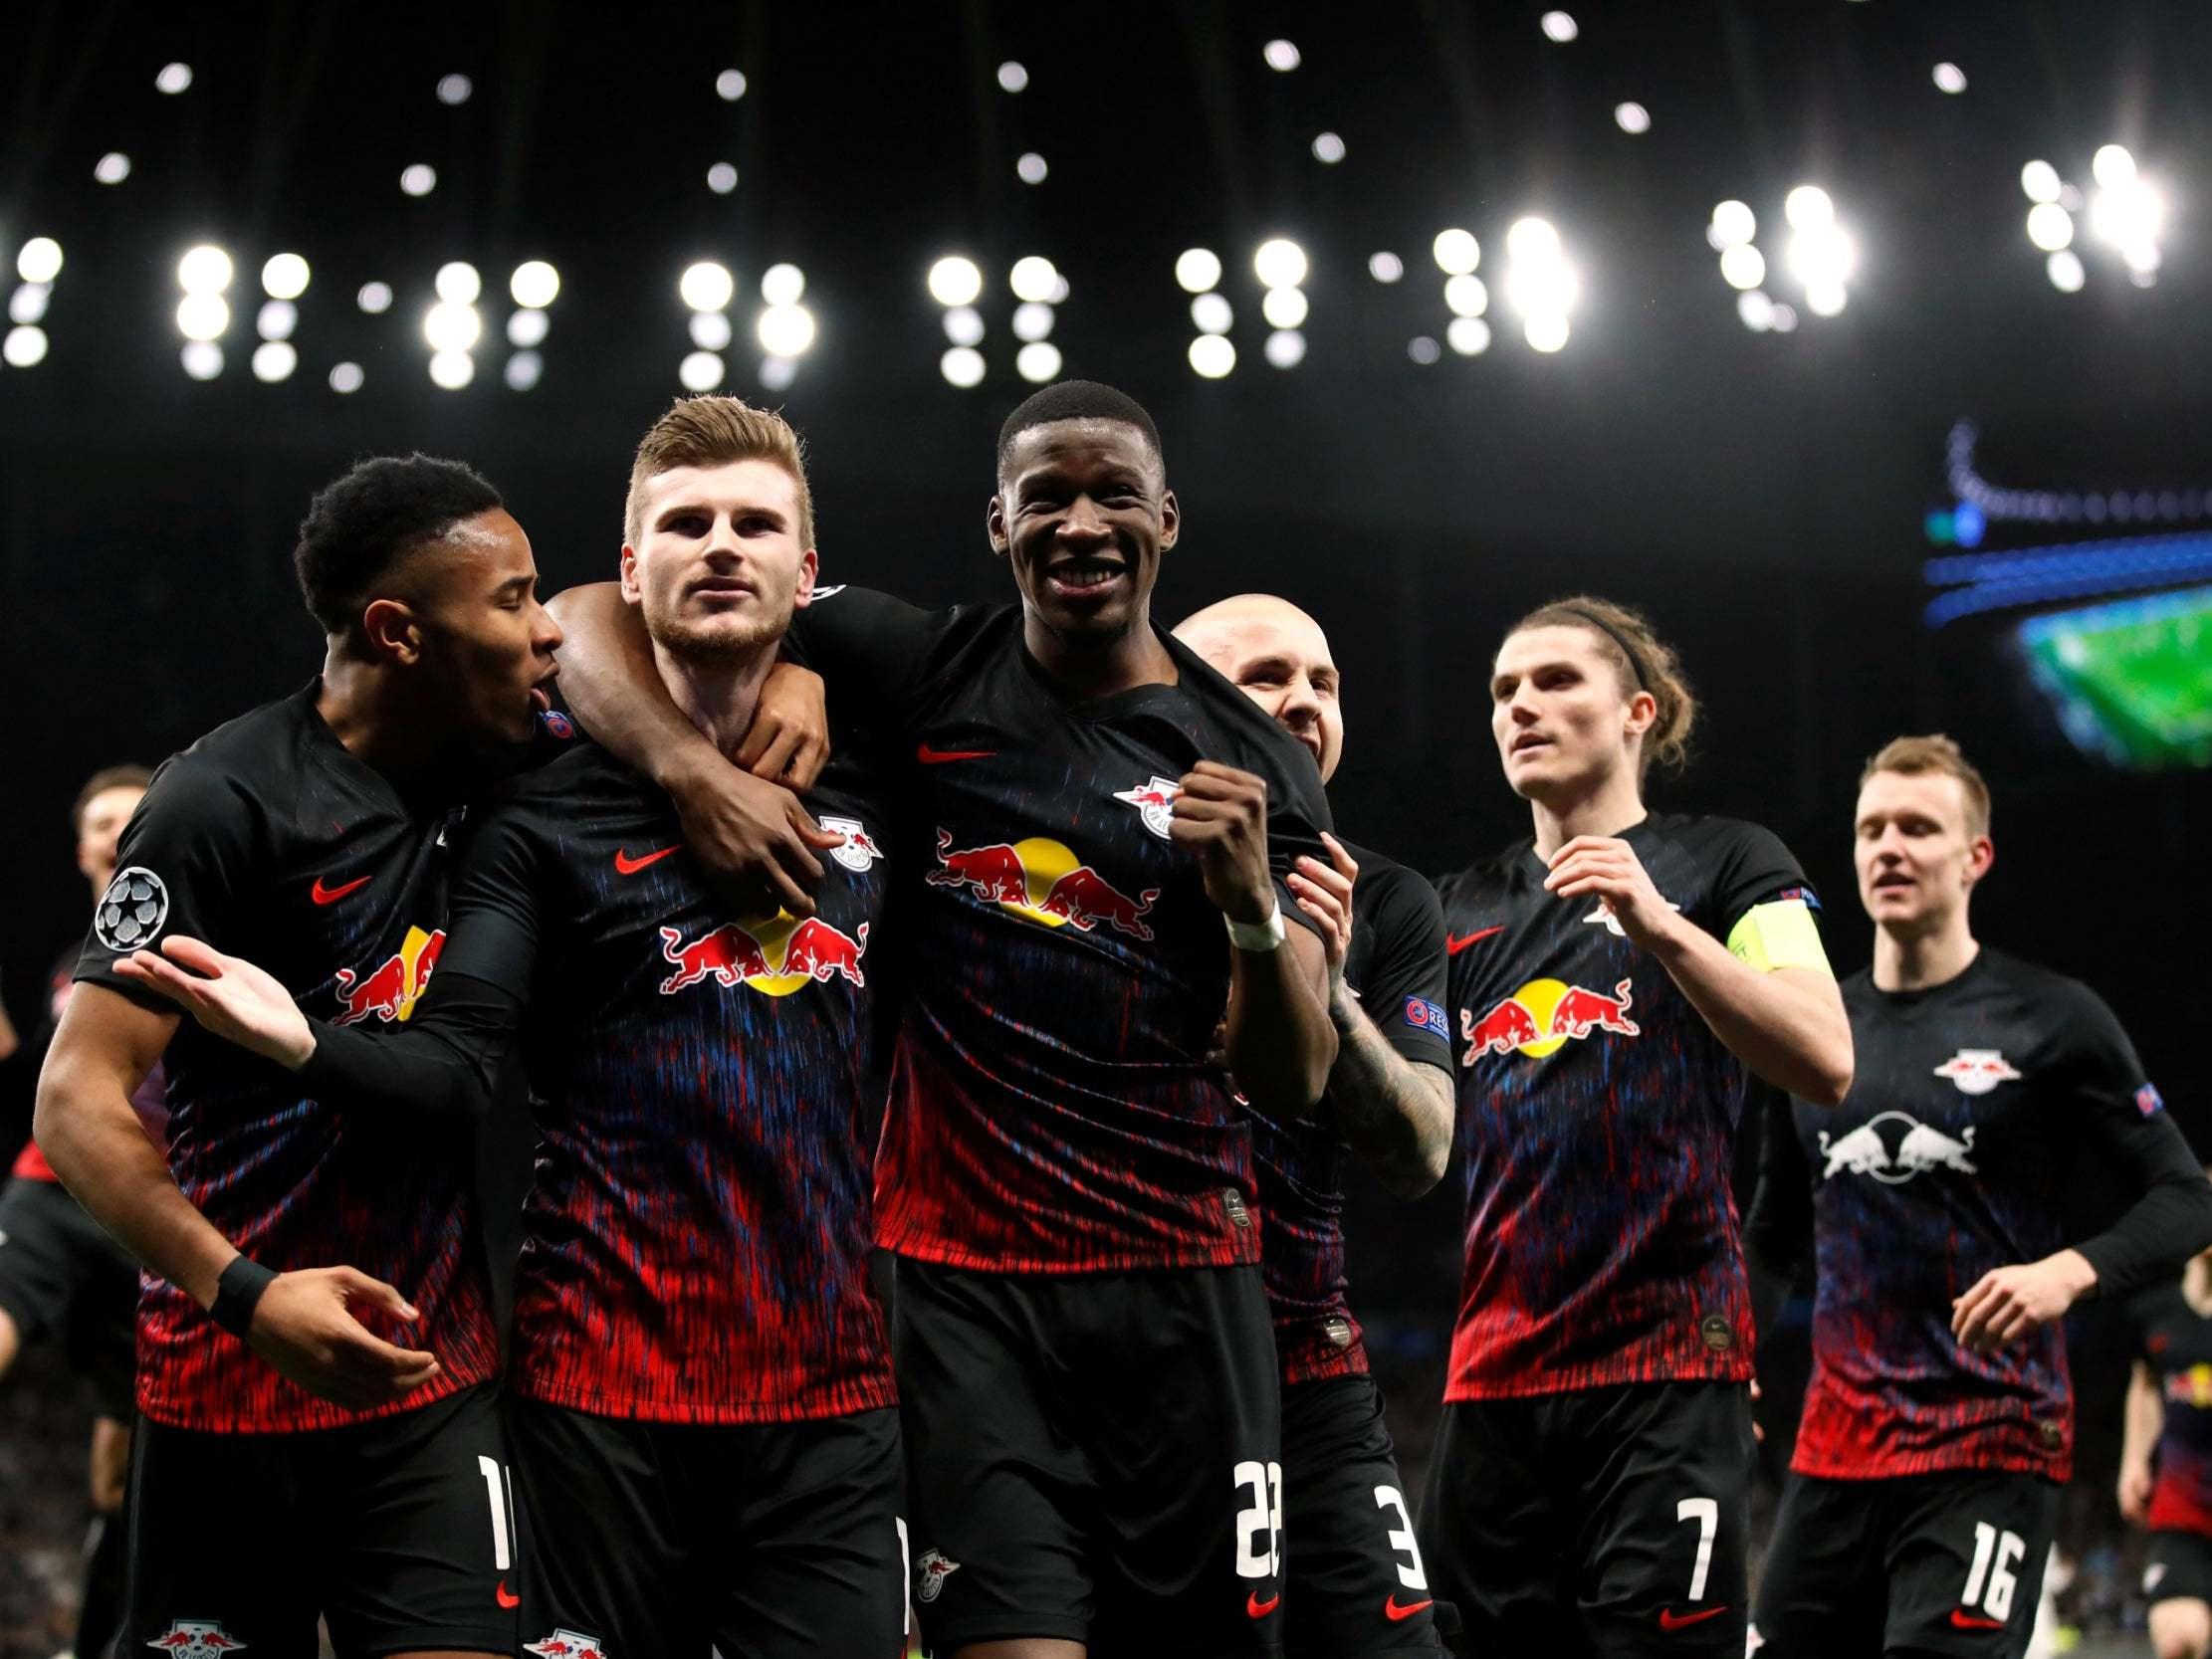 Rb Leipzig Vs Freiburg Predicted Line Ups Team News Ahead Of Bundesliga Fixture Today Crossfitcaliforniacity Com